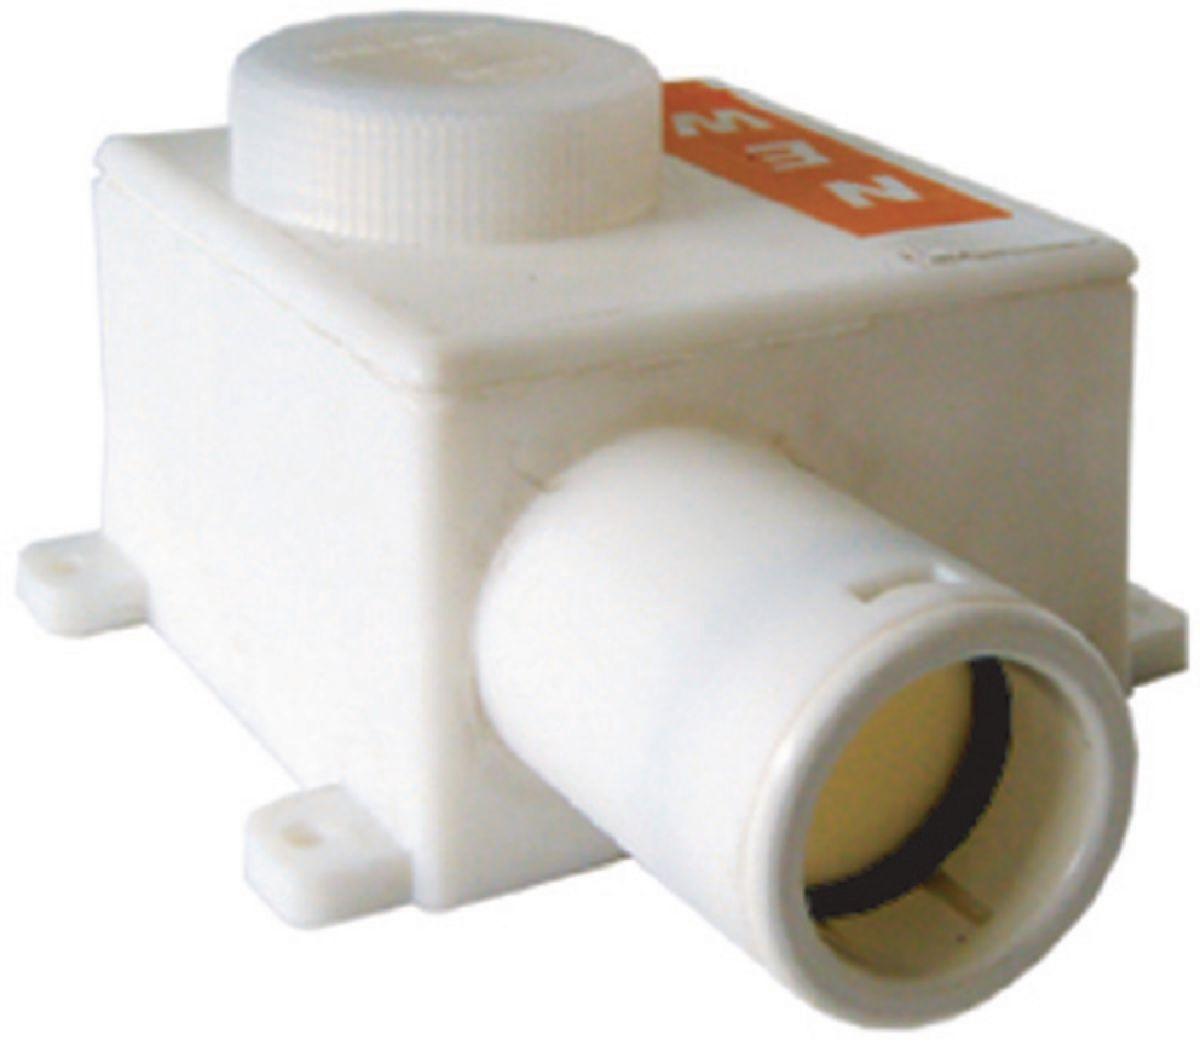 Siphon pour tube souple ou rigide (montage vertical ou horizontal) 175ACL0133